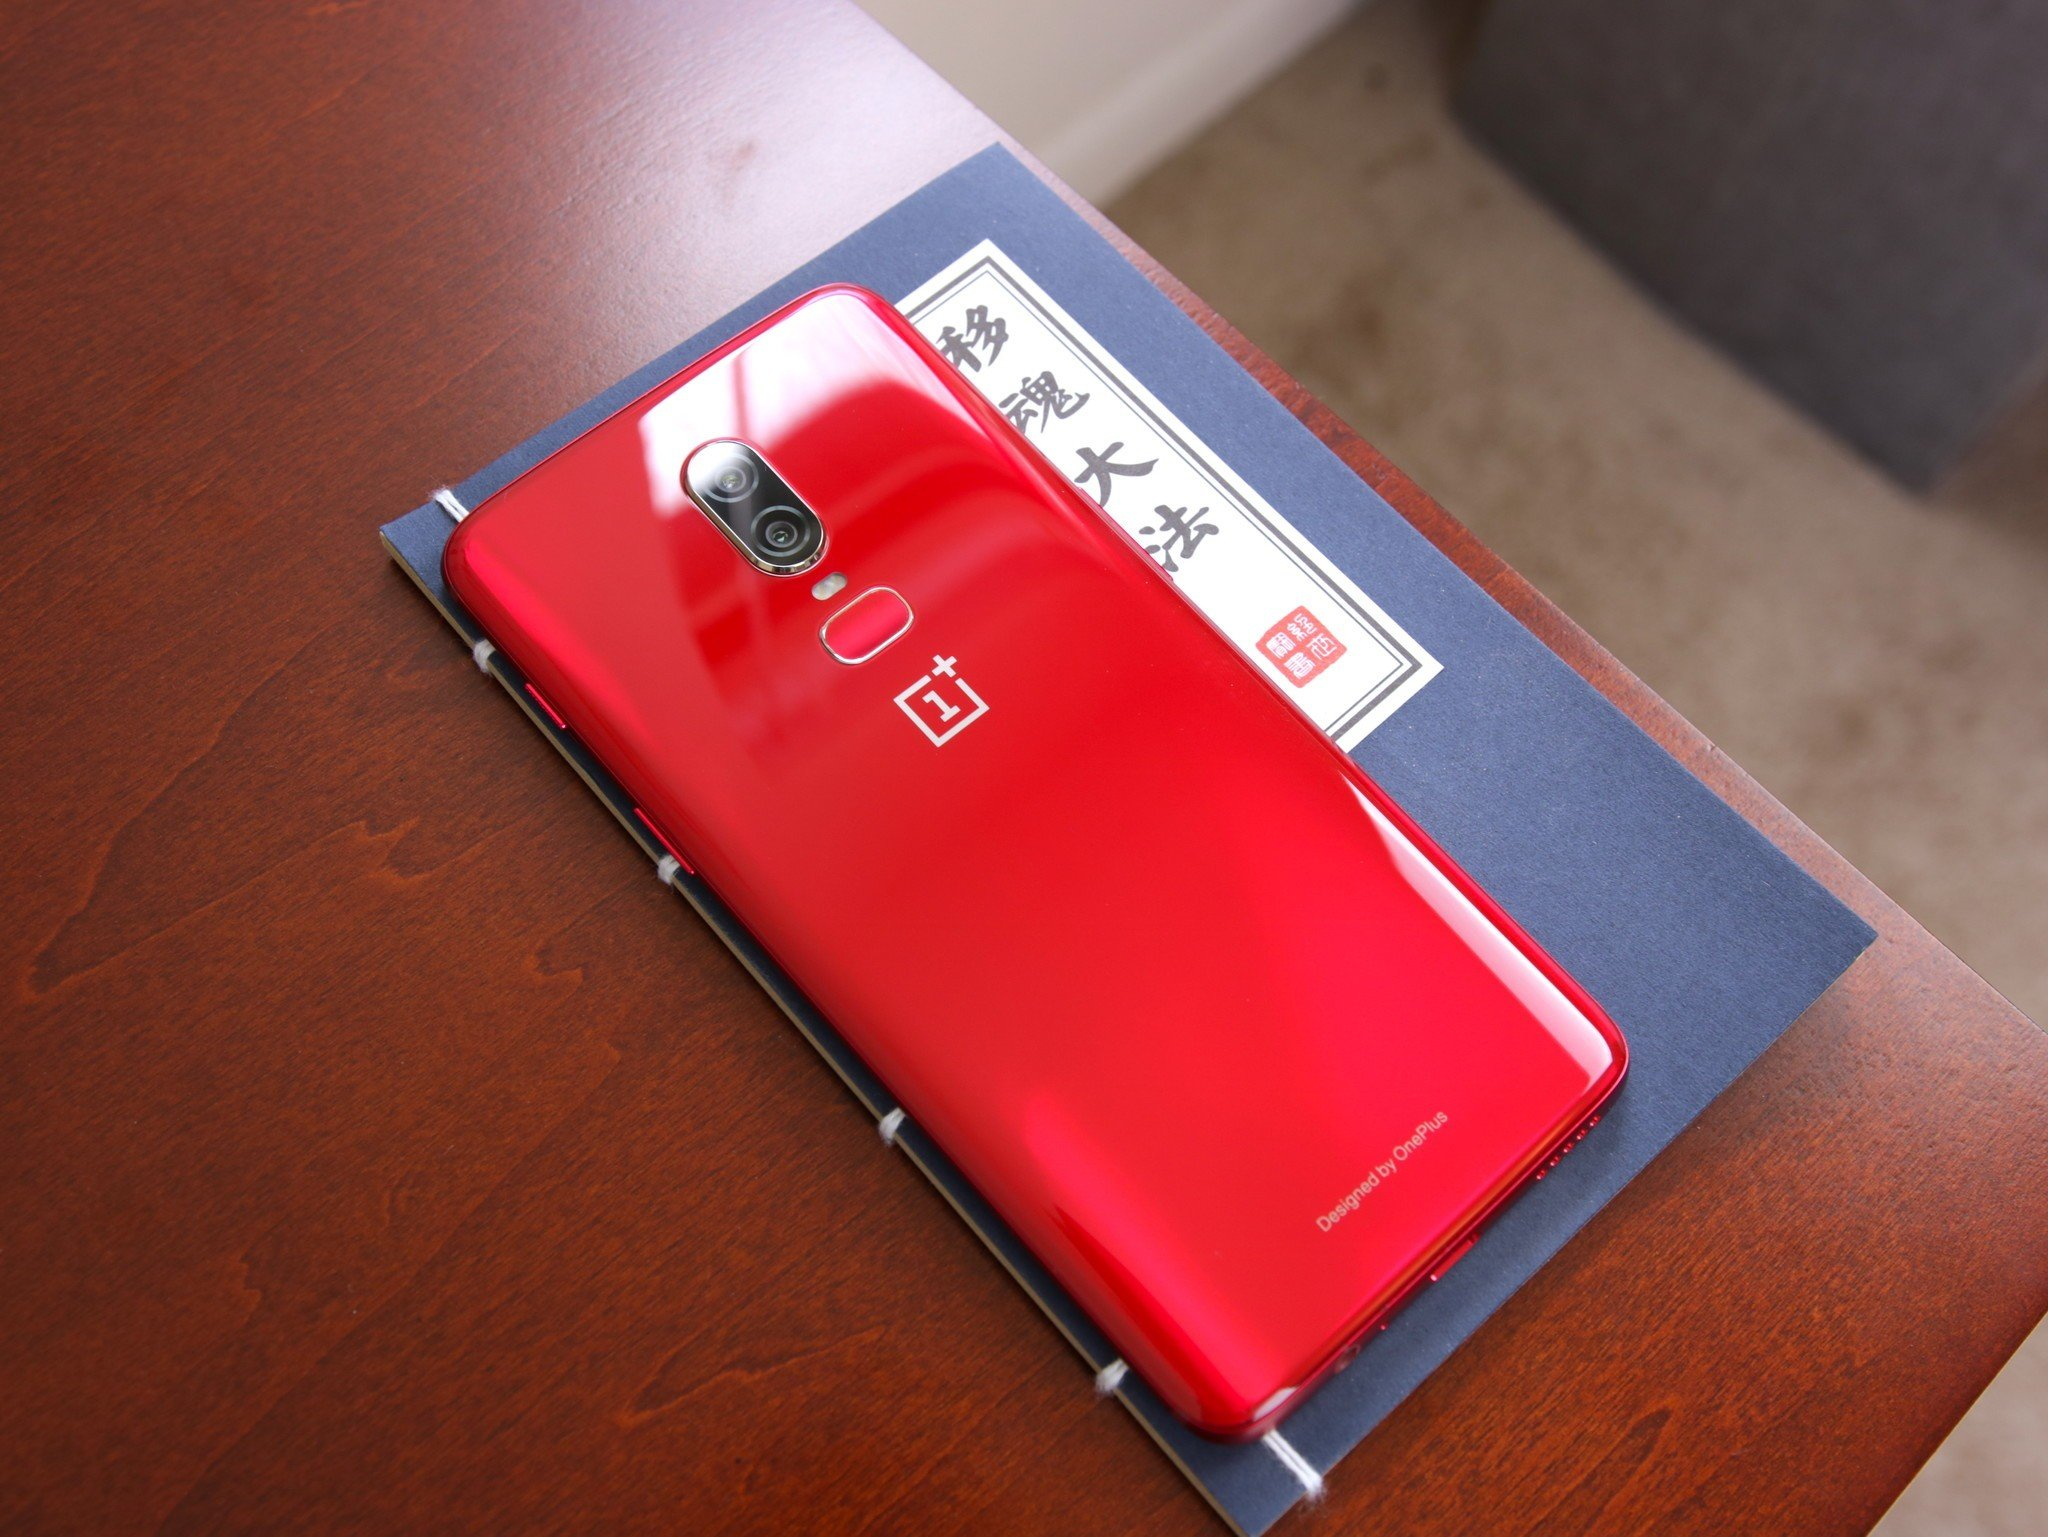 Swish Oneplus Red This Is One To Get Oneplus Red This Is One To Get Android Central Oneplus 3t Verizon Wireless Oneplus 3t Verizon Lte dpreview Oneplus 3t Verizon